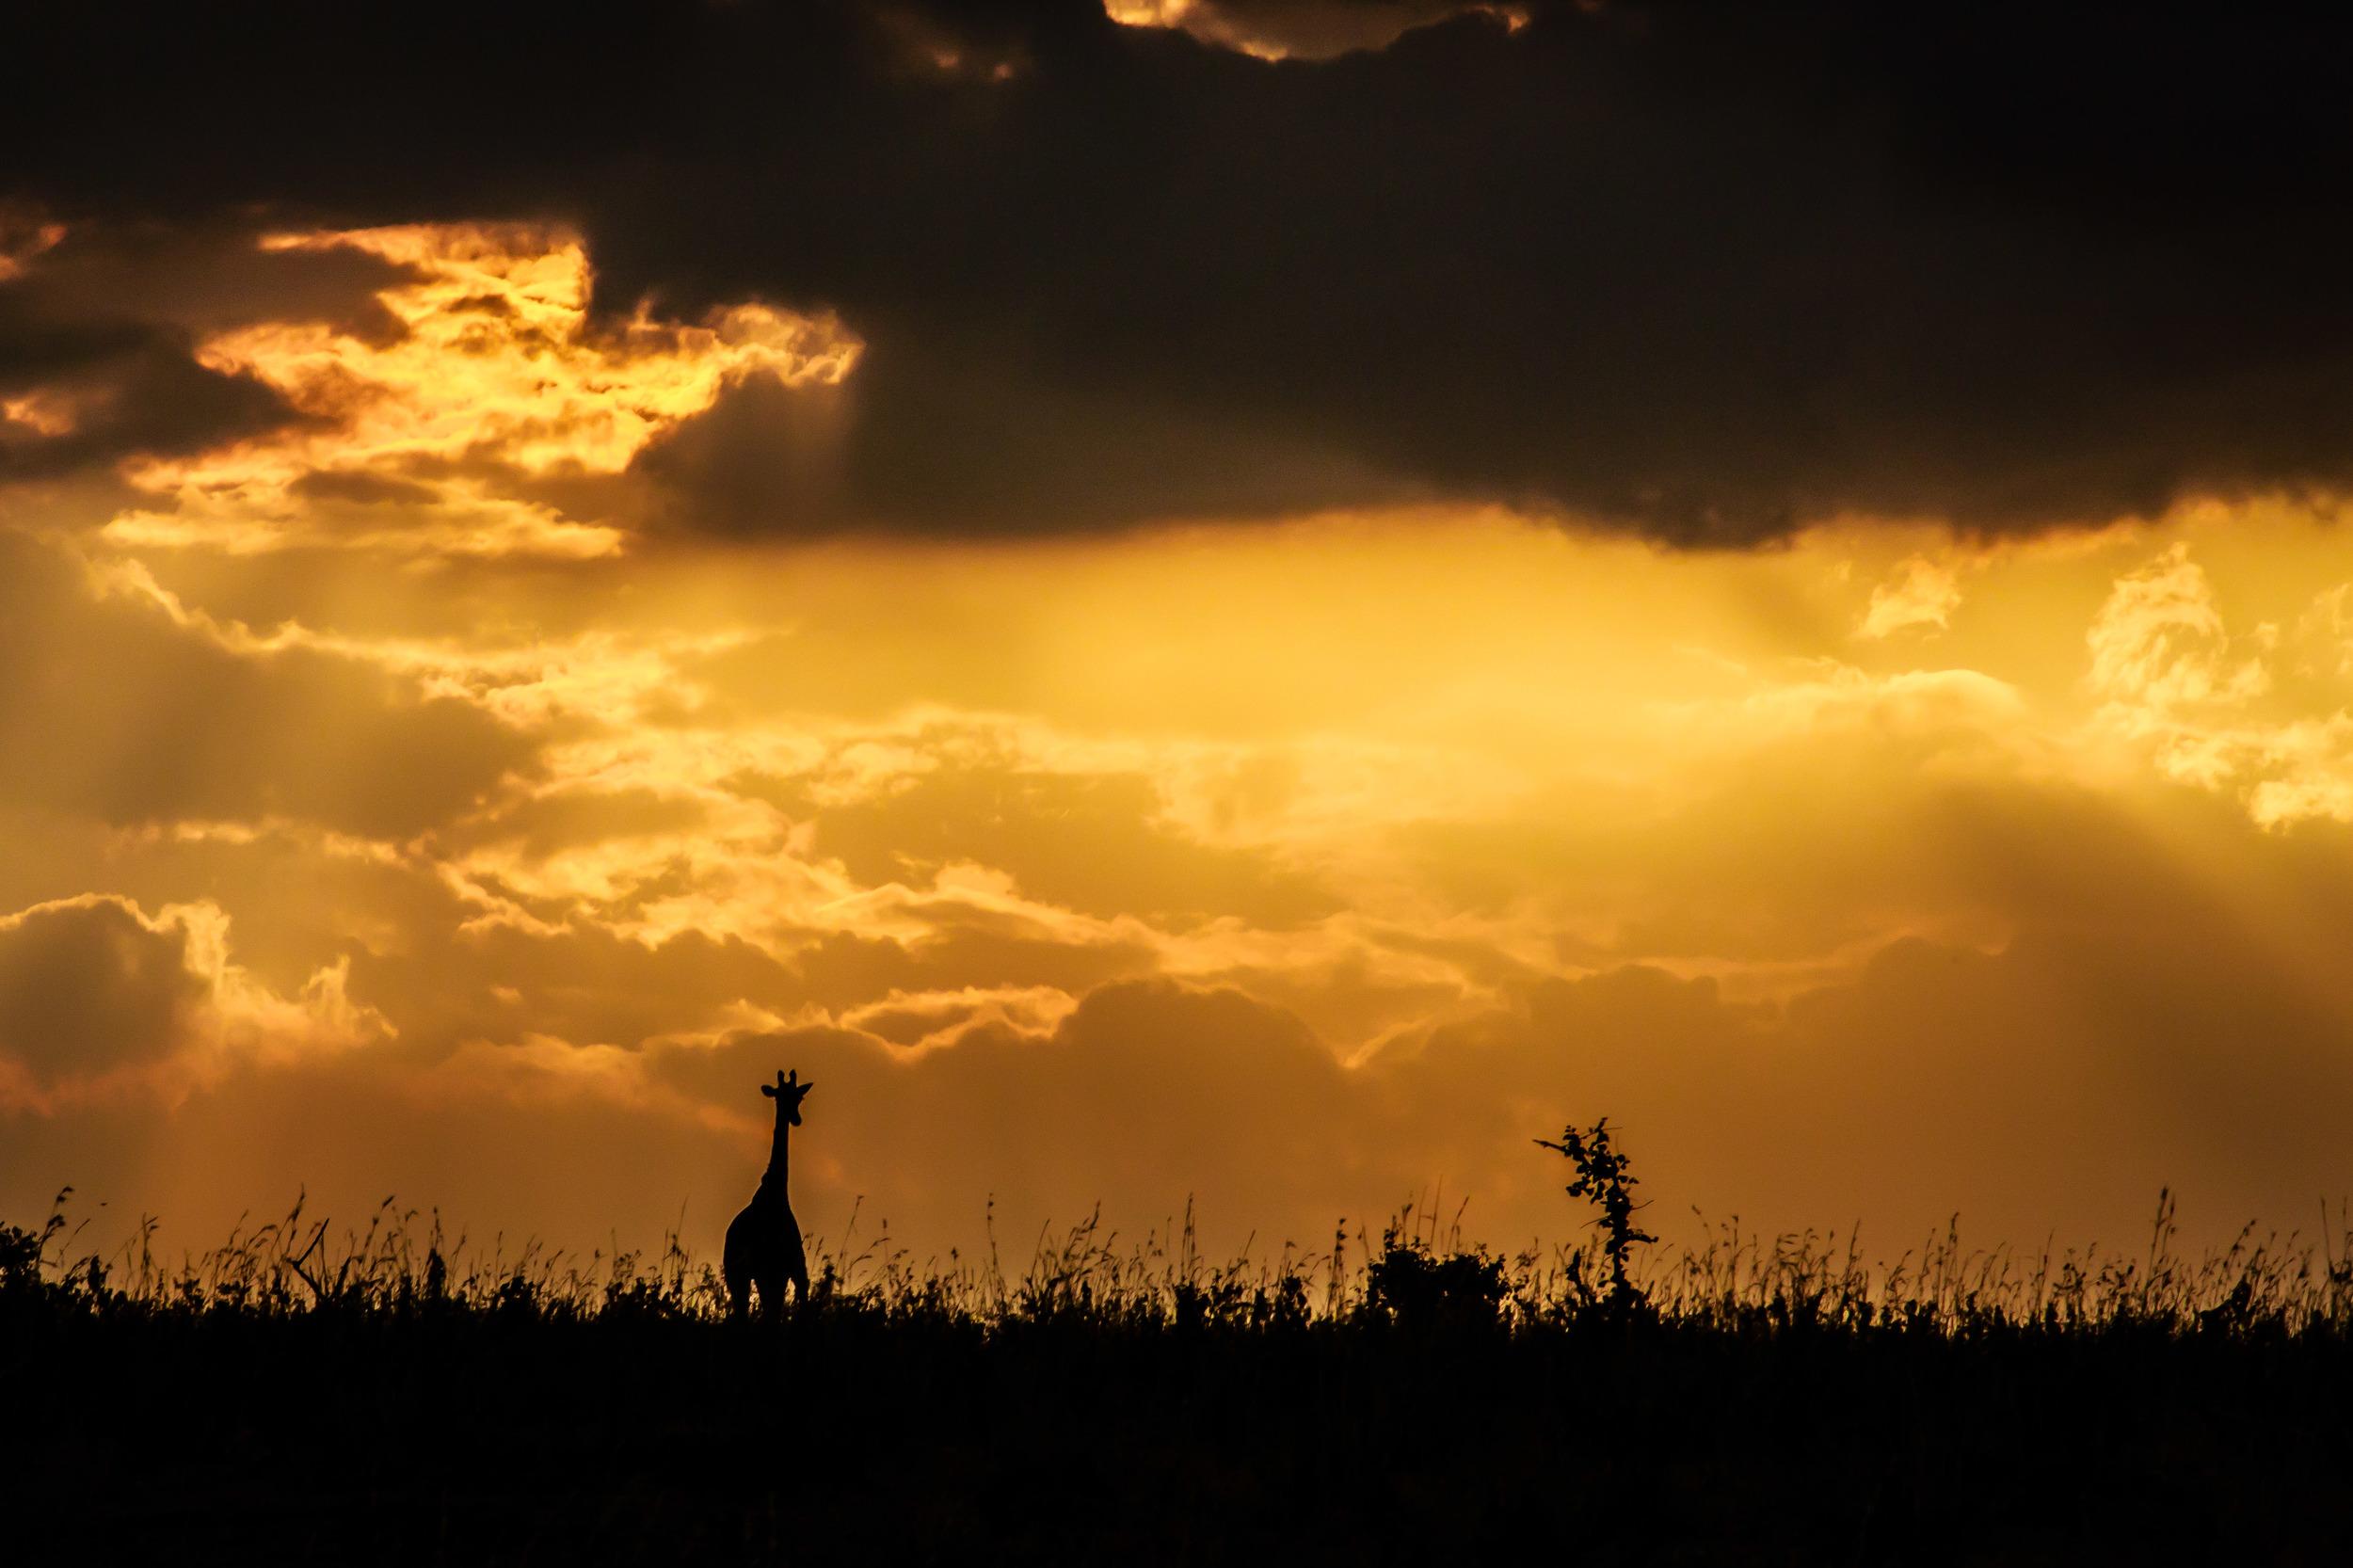 Evening Silhouette on the Masai Mara